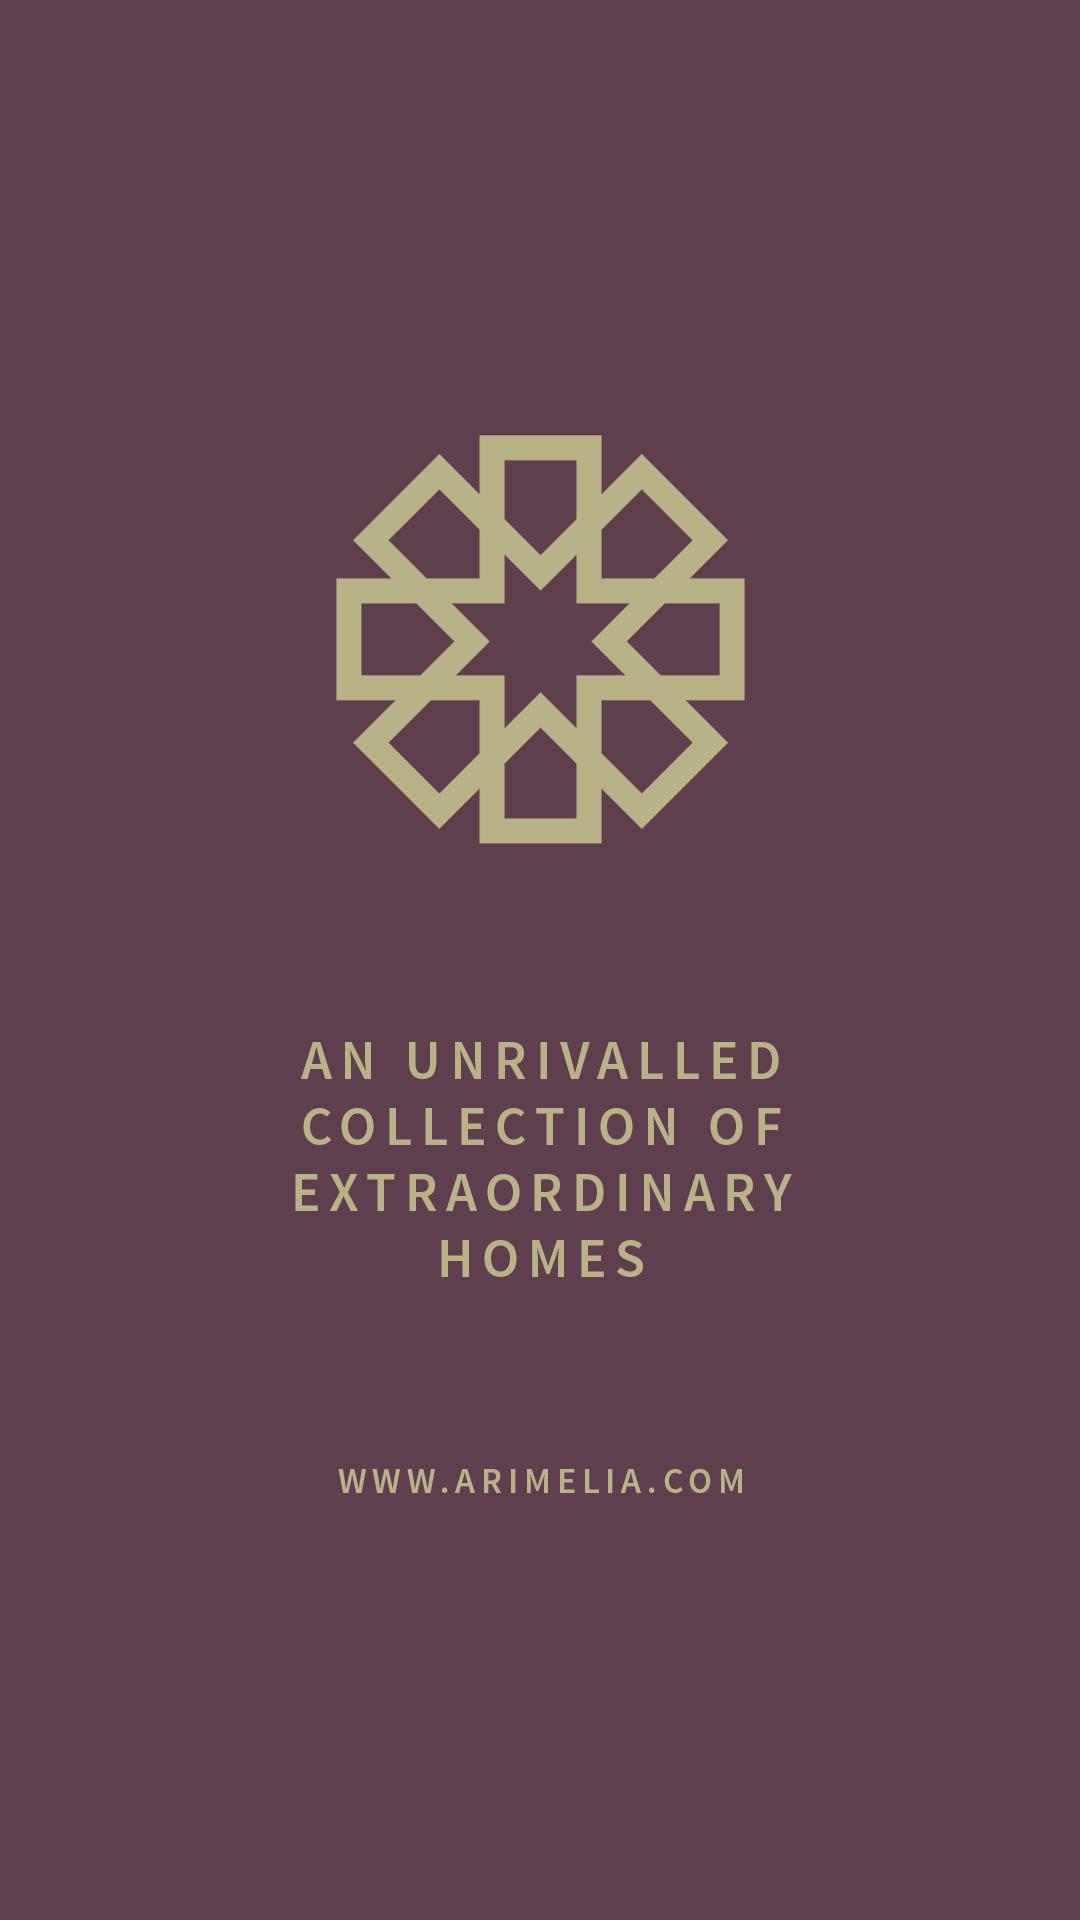 Arimelia Real Estate Story Template Design